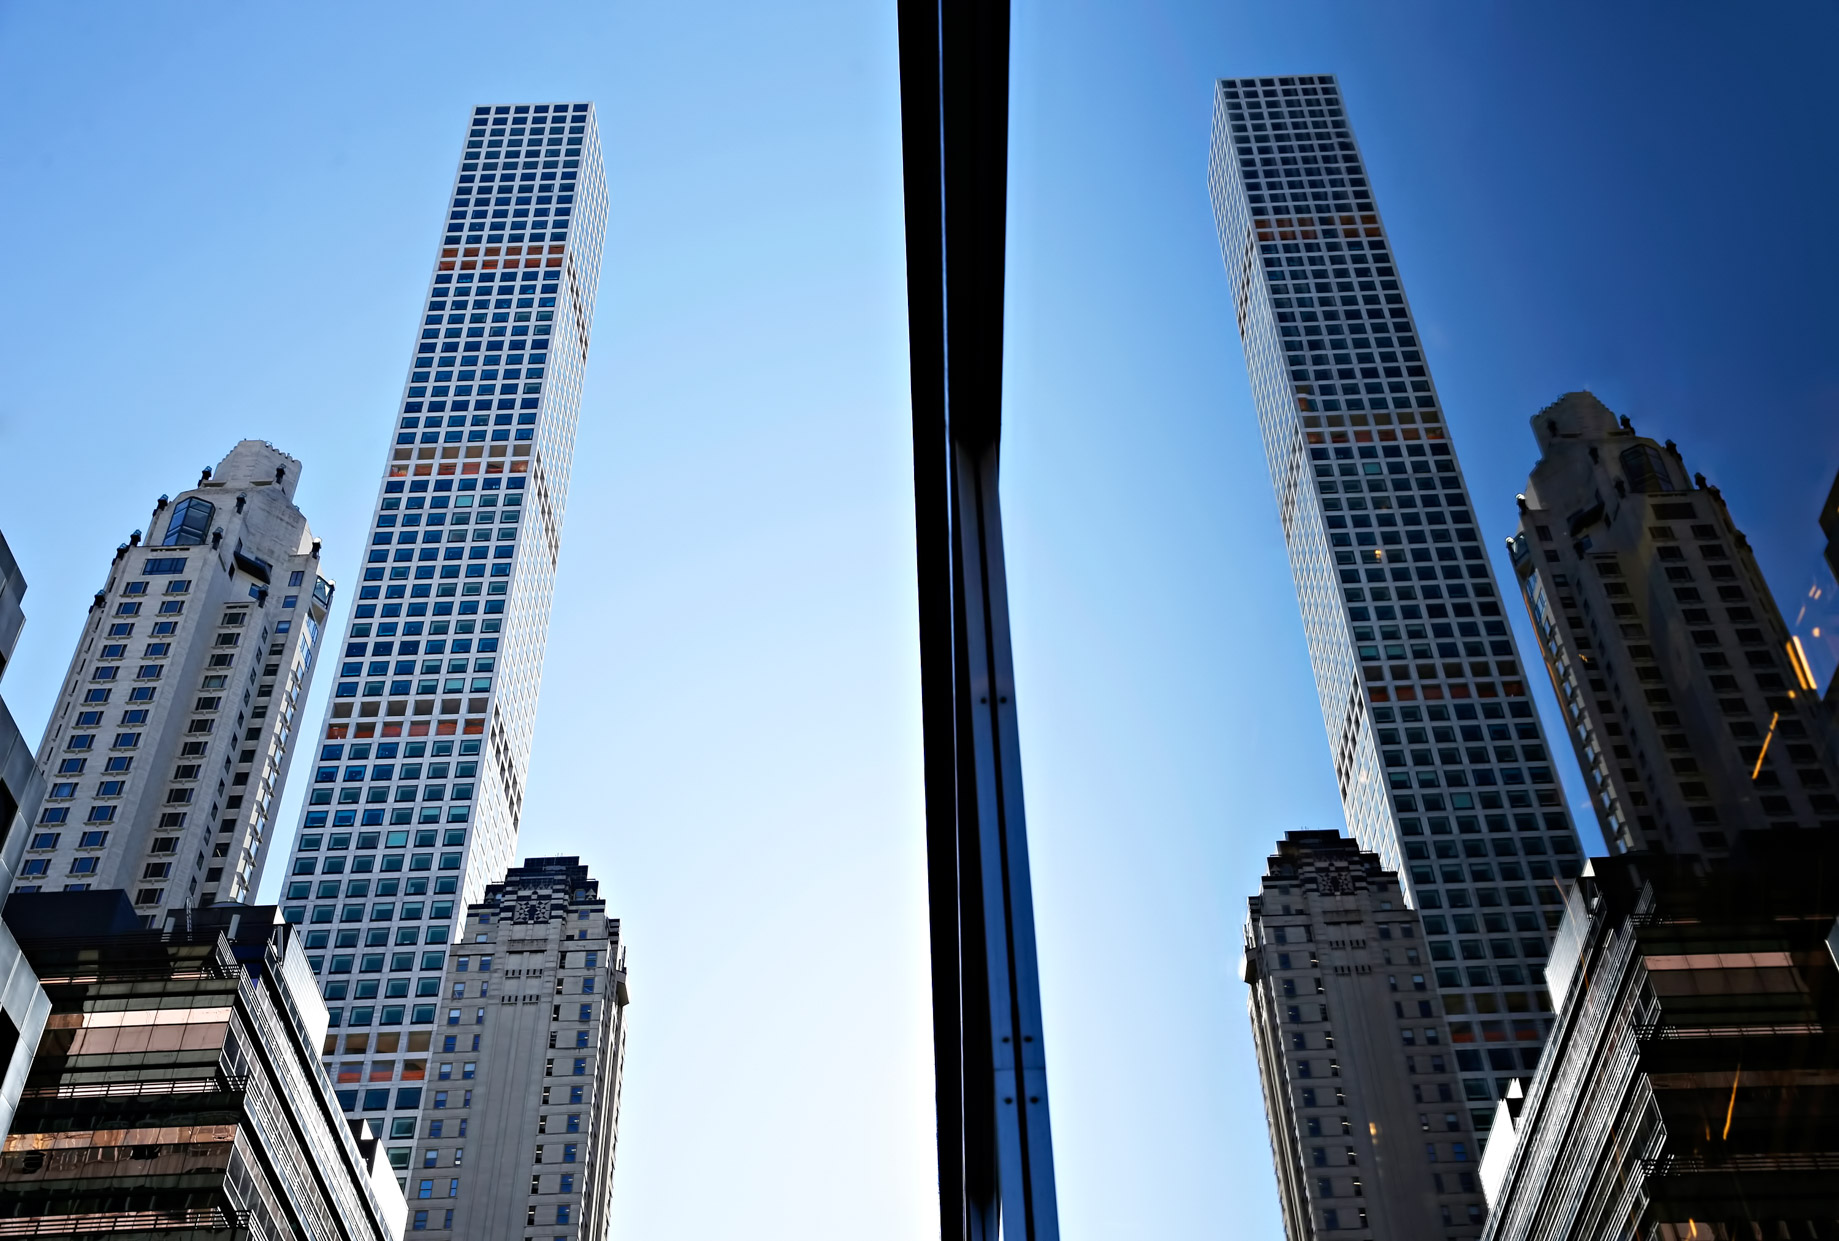 Reflections of 432 Park Ave - 432 Park Ave, New York, NY 10022, USA